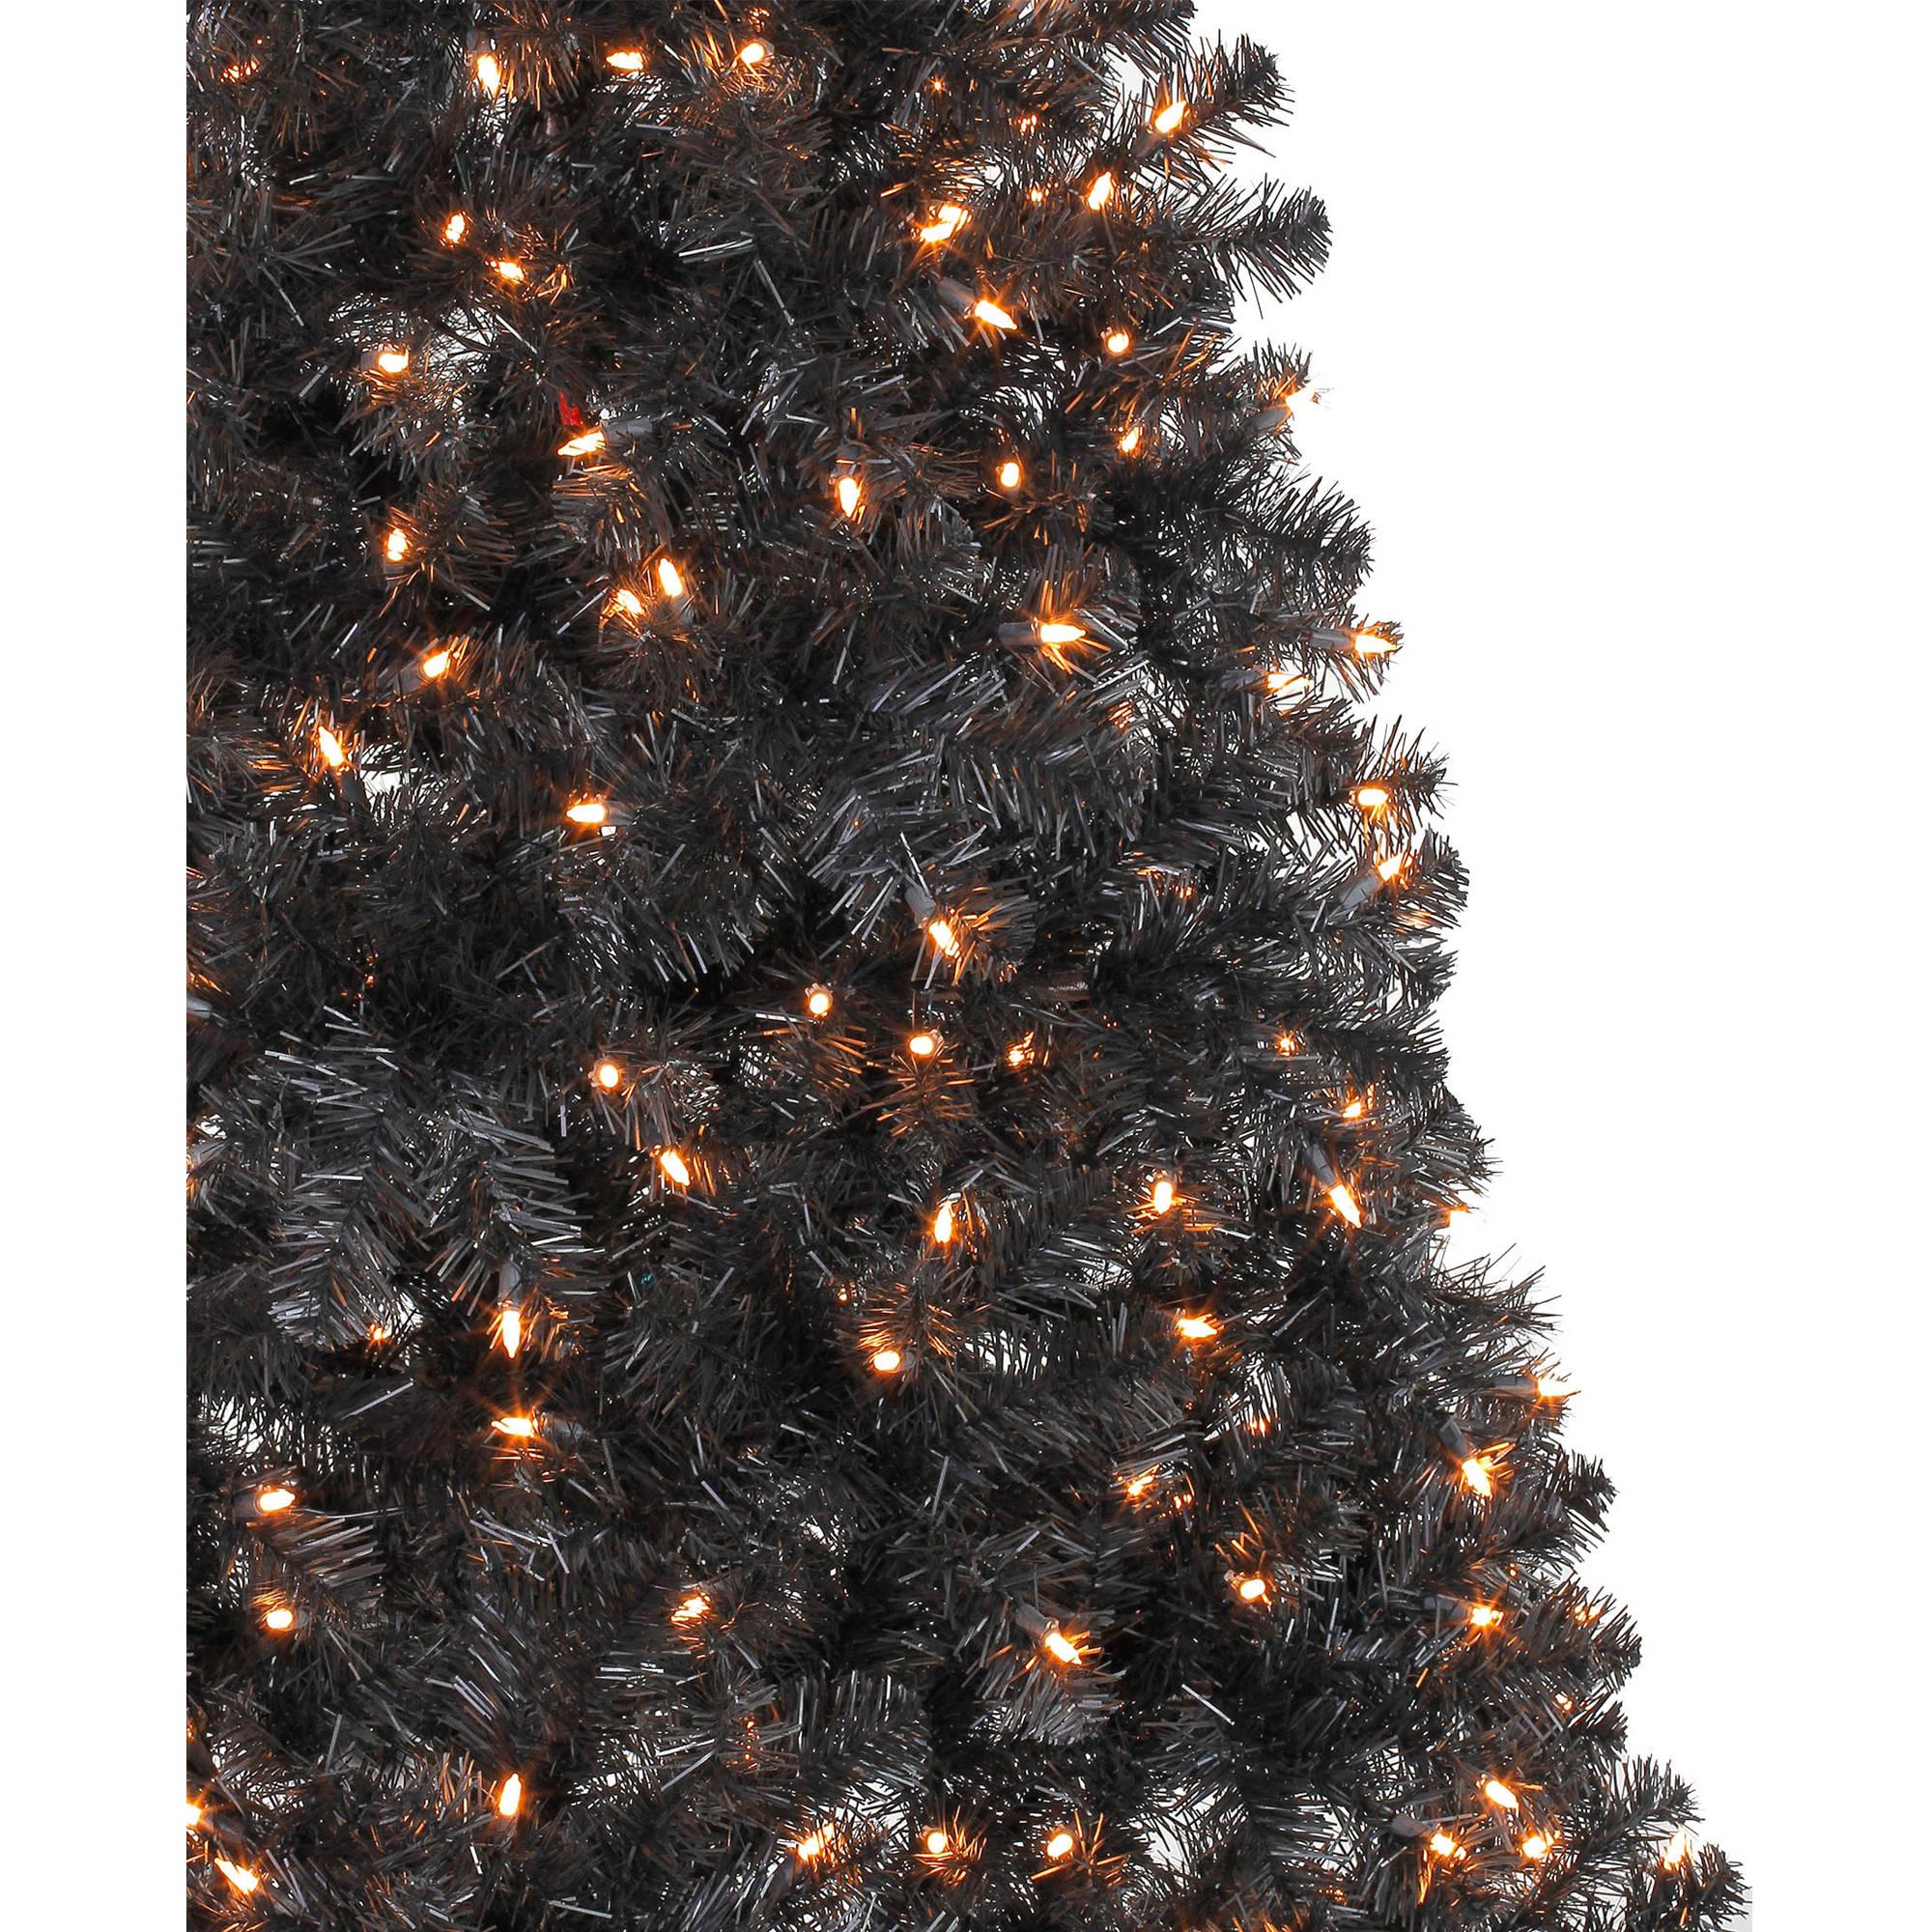 Artificial Christmas Pine Tree 6.5' Pre-Lit Black Clear ...